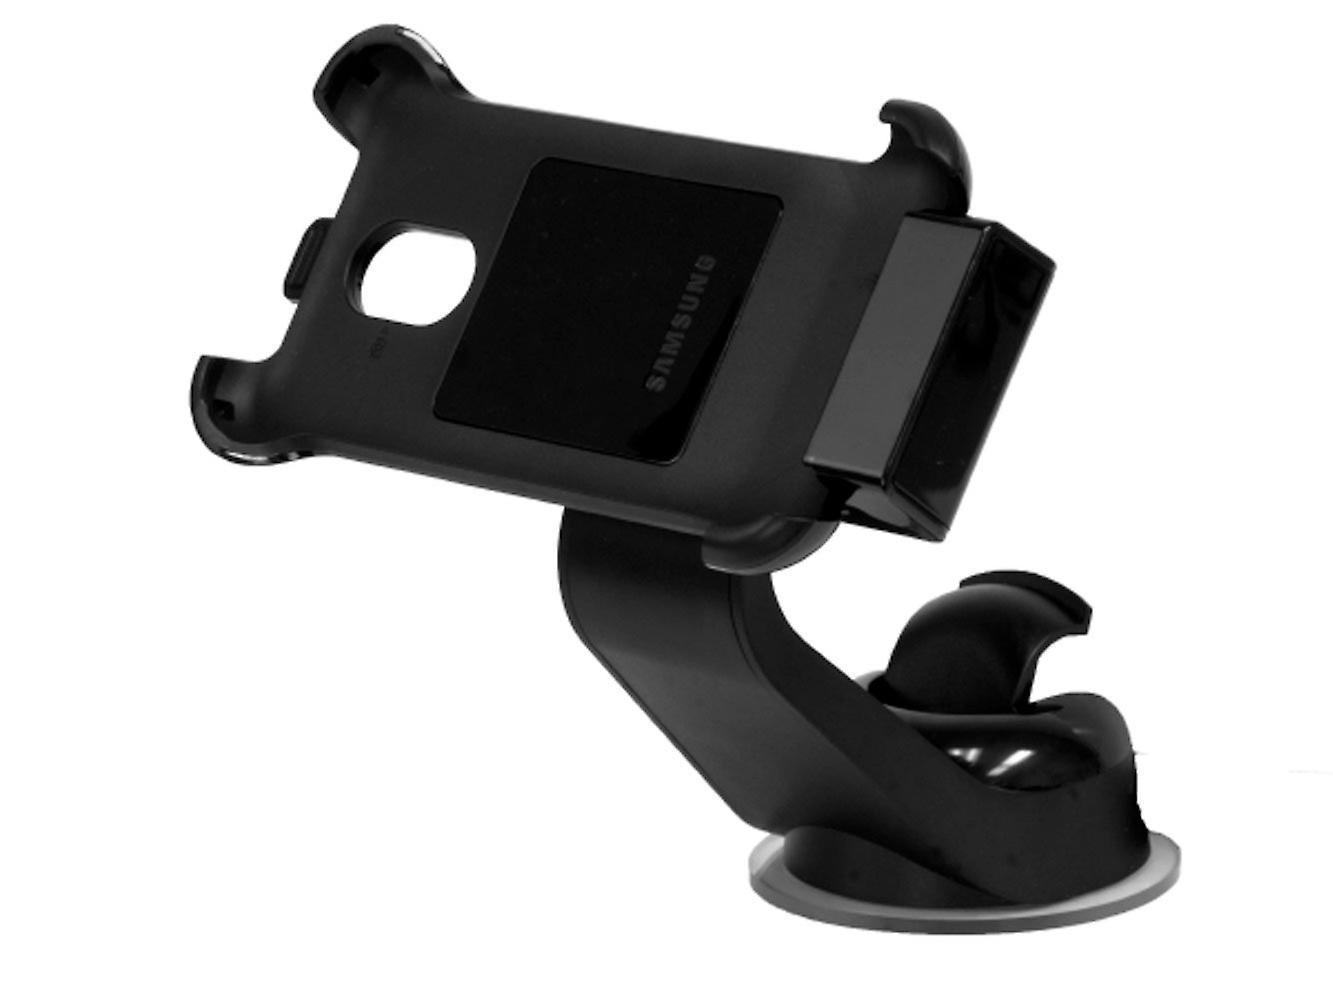 Samsung ECS-K1D9BEGSTA Sprint SPH-D710 Vehicle Mount - Car Kit - Black